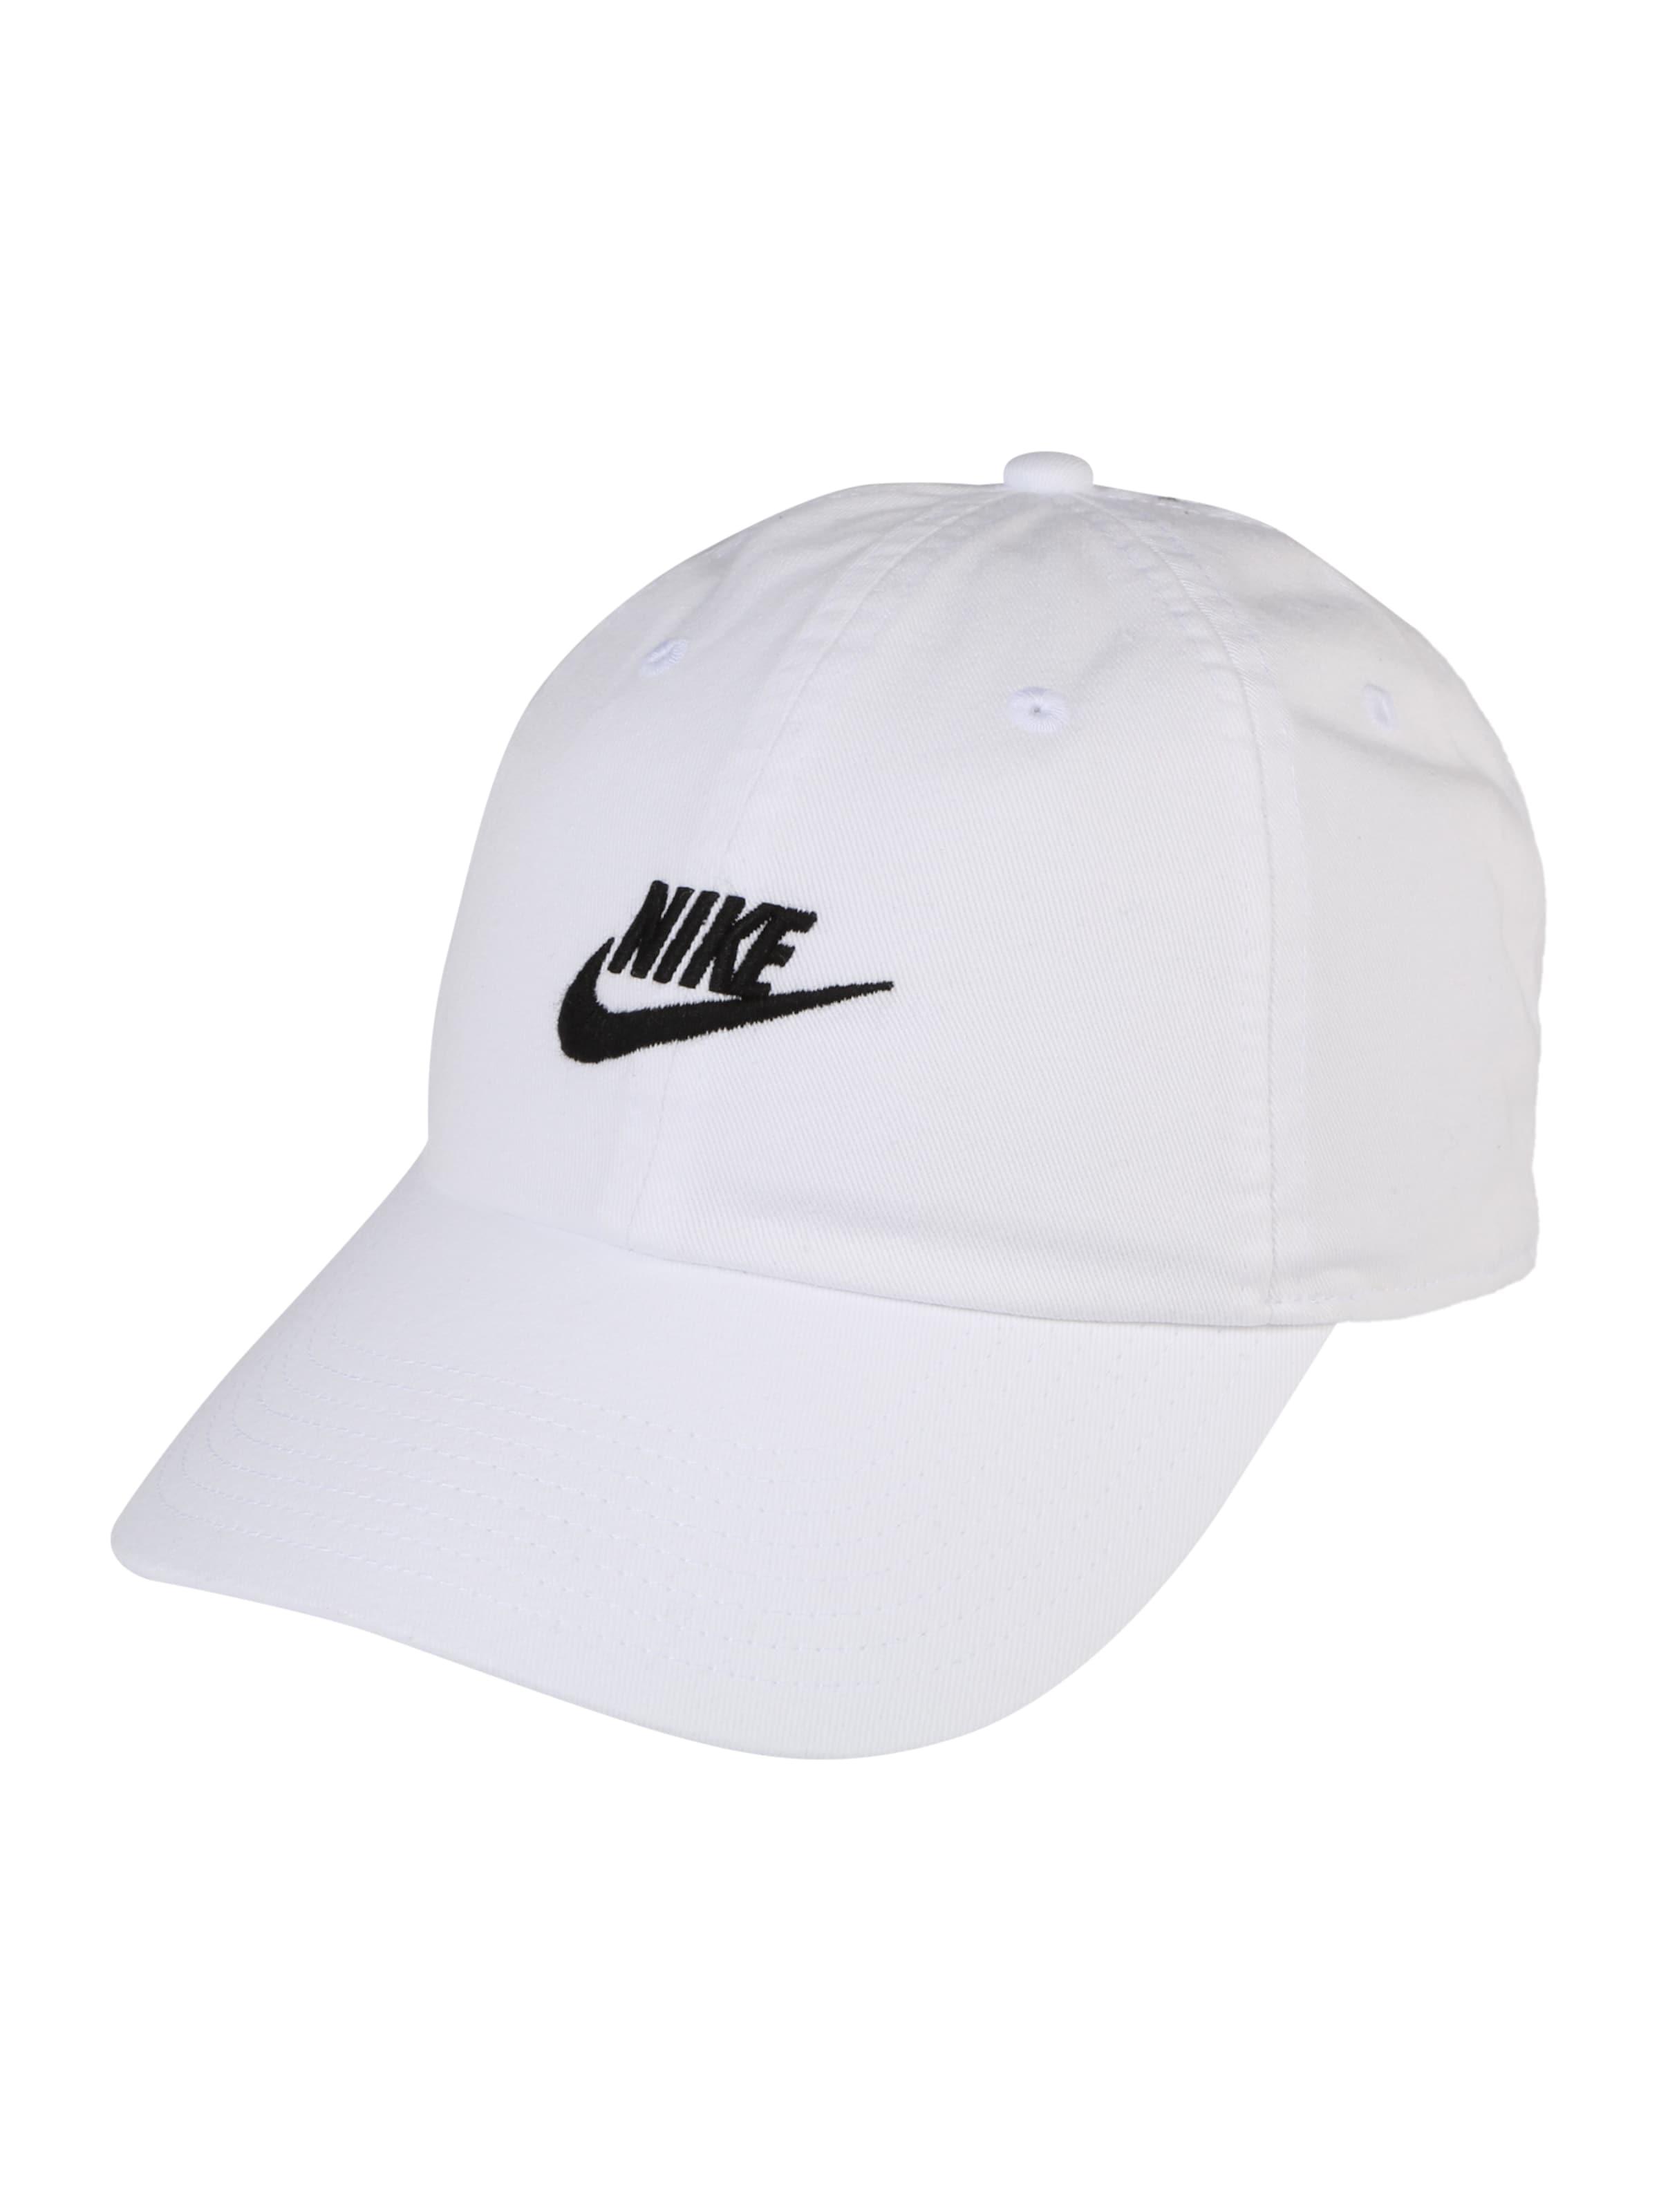 Futura Nike Cap Washed' Sportswear 'h86 In Weiß jcq34LR5AS